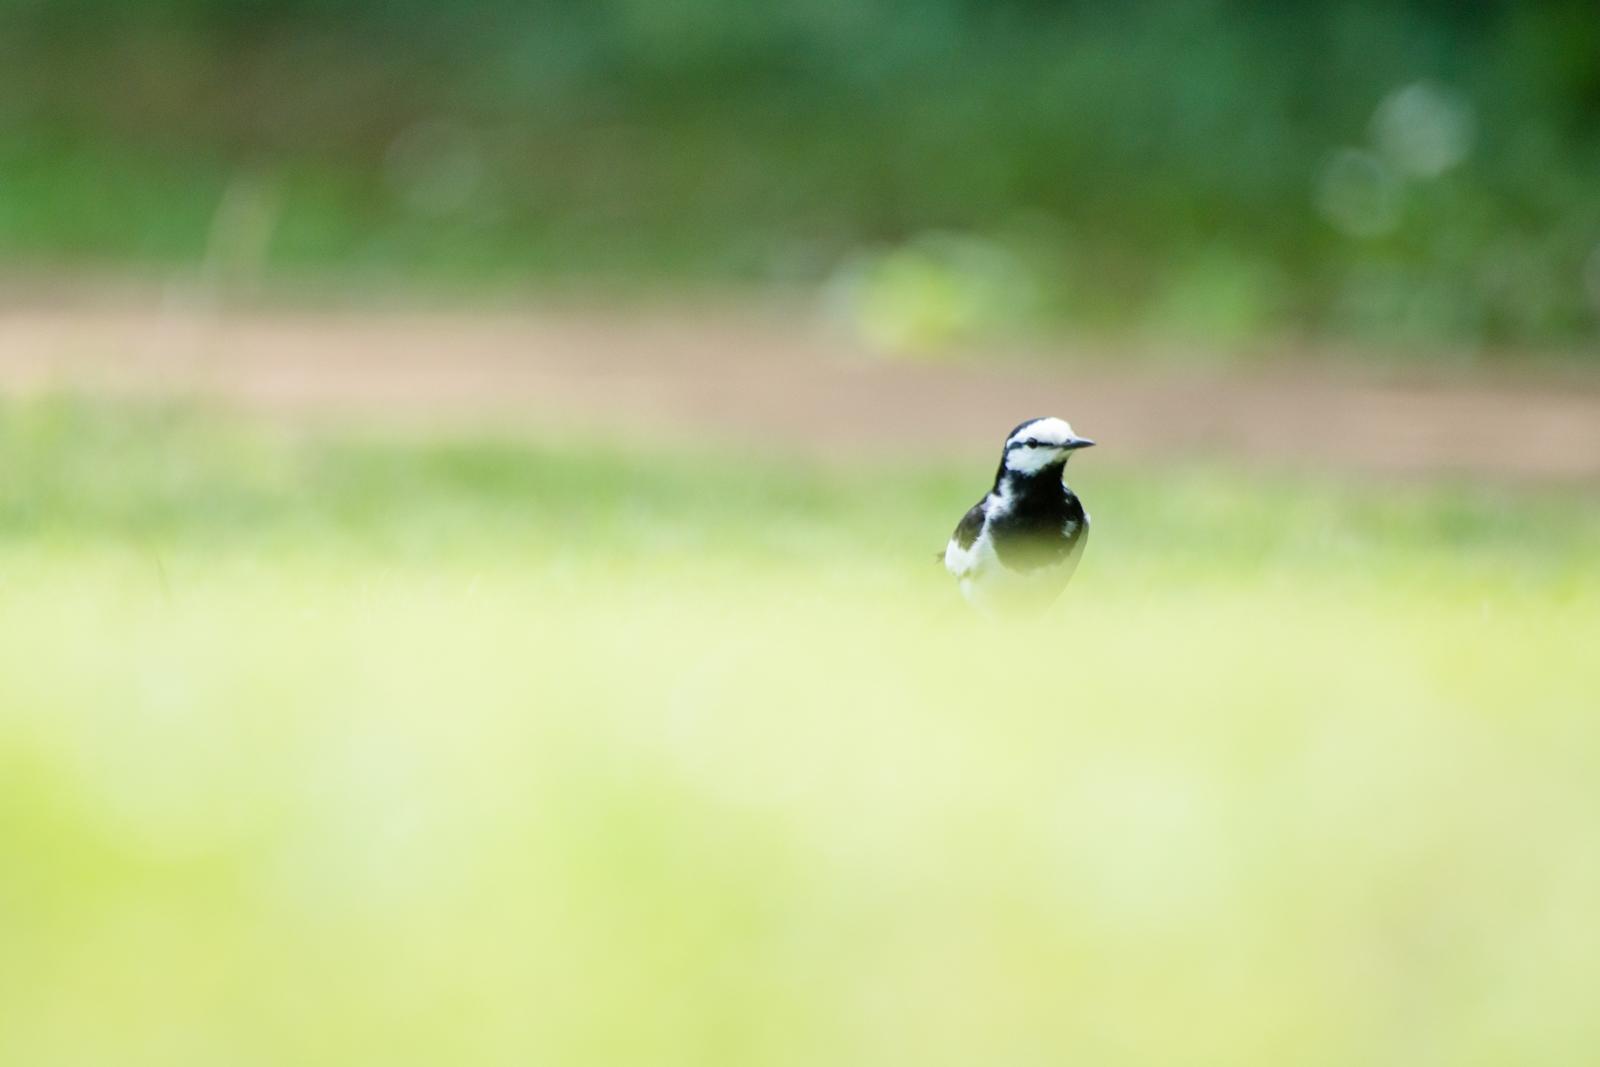 Photo: 原っぱ散策 Open field walk.  静かな原っぱ 陽射しが降りそそぎ 淡く輝く のんびりのびのび 楽しい時間  White Wagtail. (ハクセキレイ)  #birdphotography #birds  #cooljapan #kawaii  #nikon #sigma   Nikon D7200 SIGMA APO 50-500mm F5-6.3 DG OS HSM  ・小鳥の詩朗読 /poetry reading https://youtu.be/7ffco_Fjy6k?list=PL2YtHGm0-R3qVsaqvQe9OYdJFCkI98wzF